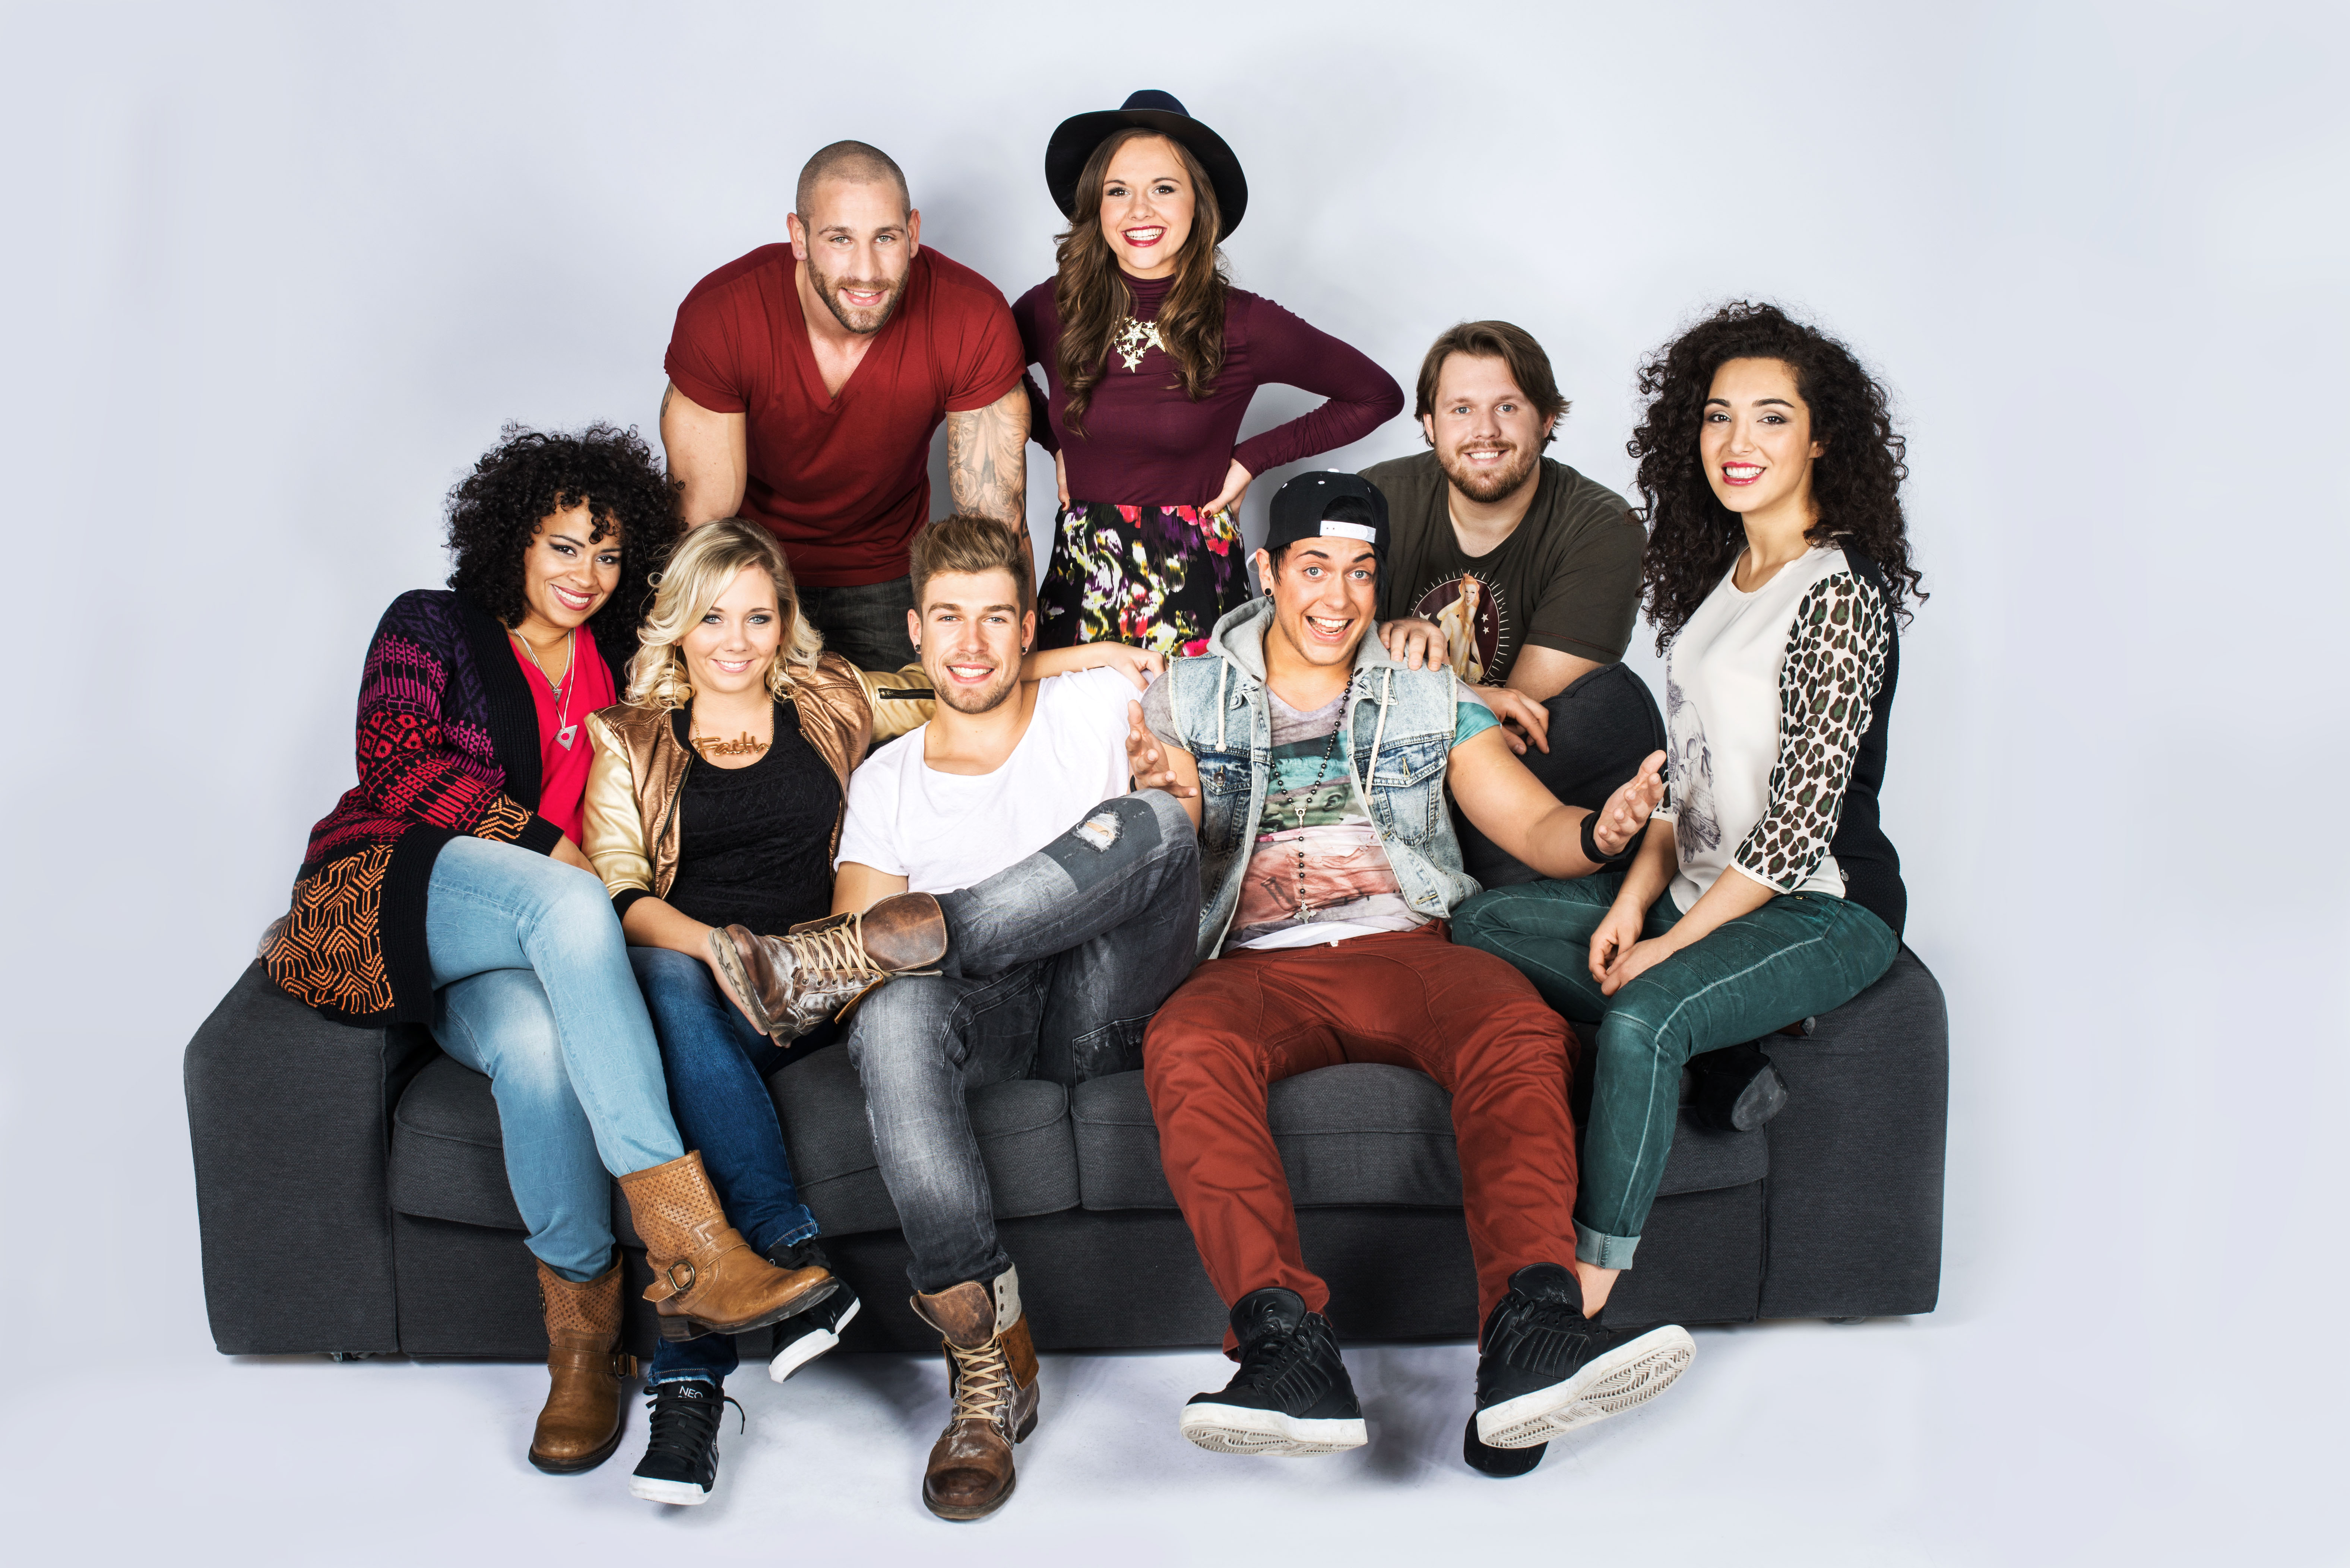 oben, v.l.n.r.: Patrick, Anna, Jan; unten v.l.n.r.: Sam, Chantal, Chris, Kevin, Joleen (Quelle: RTL2)